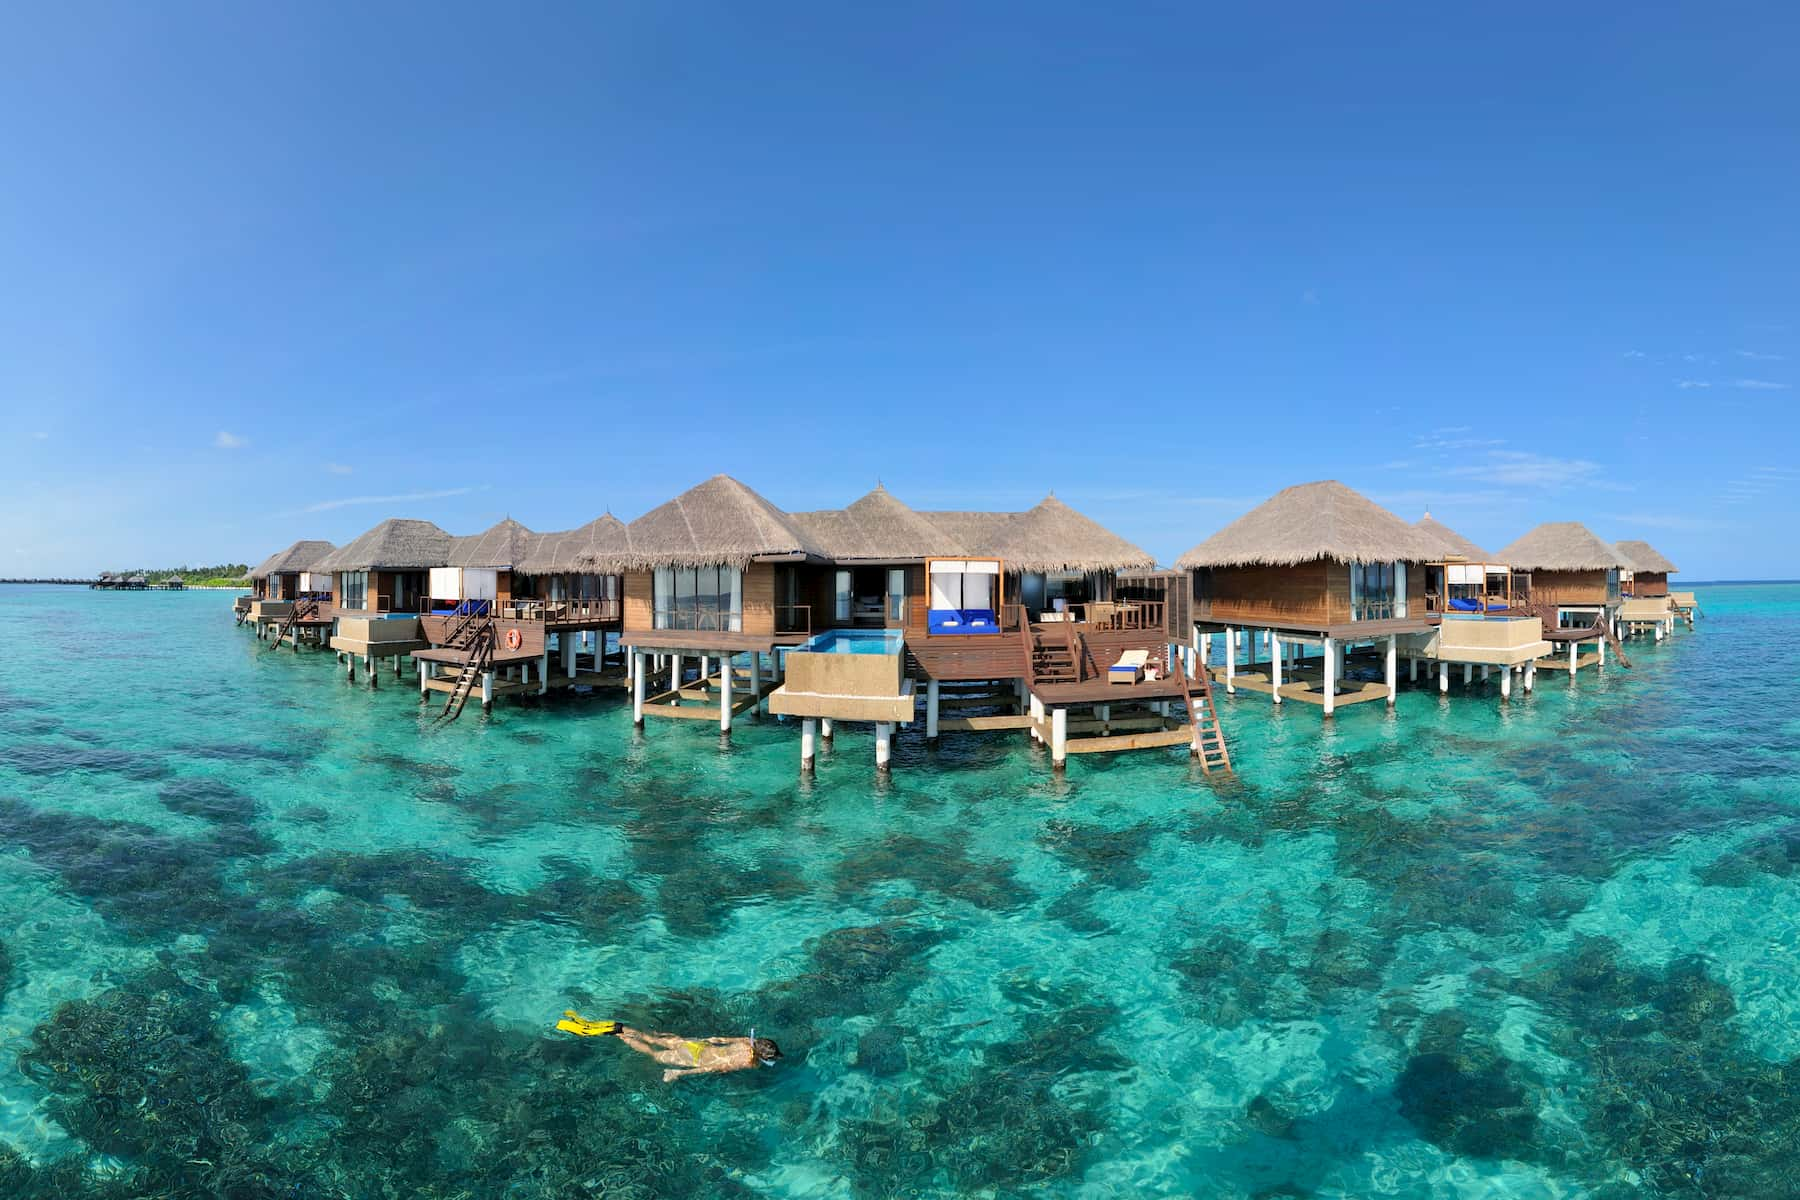 Coco Palm Bodu Hithi resort Maldive water residence